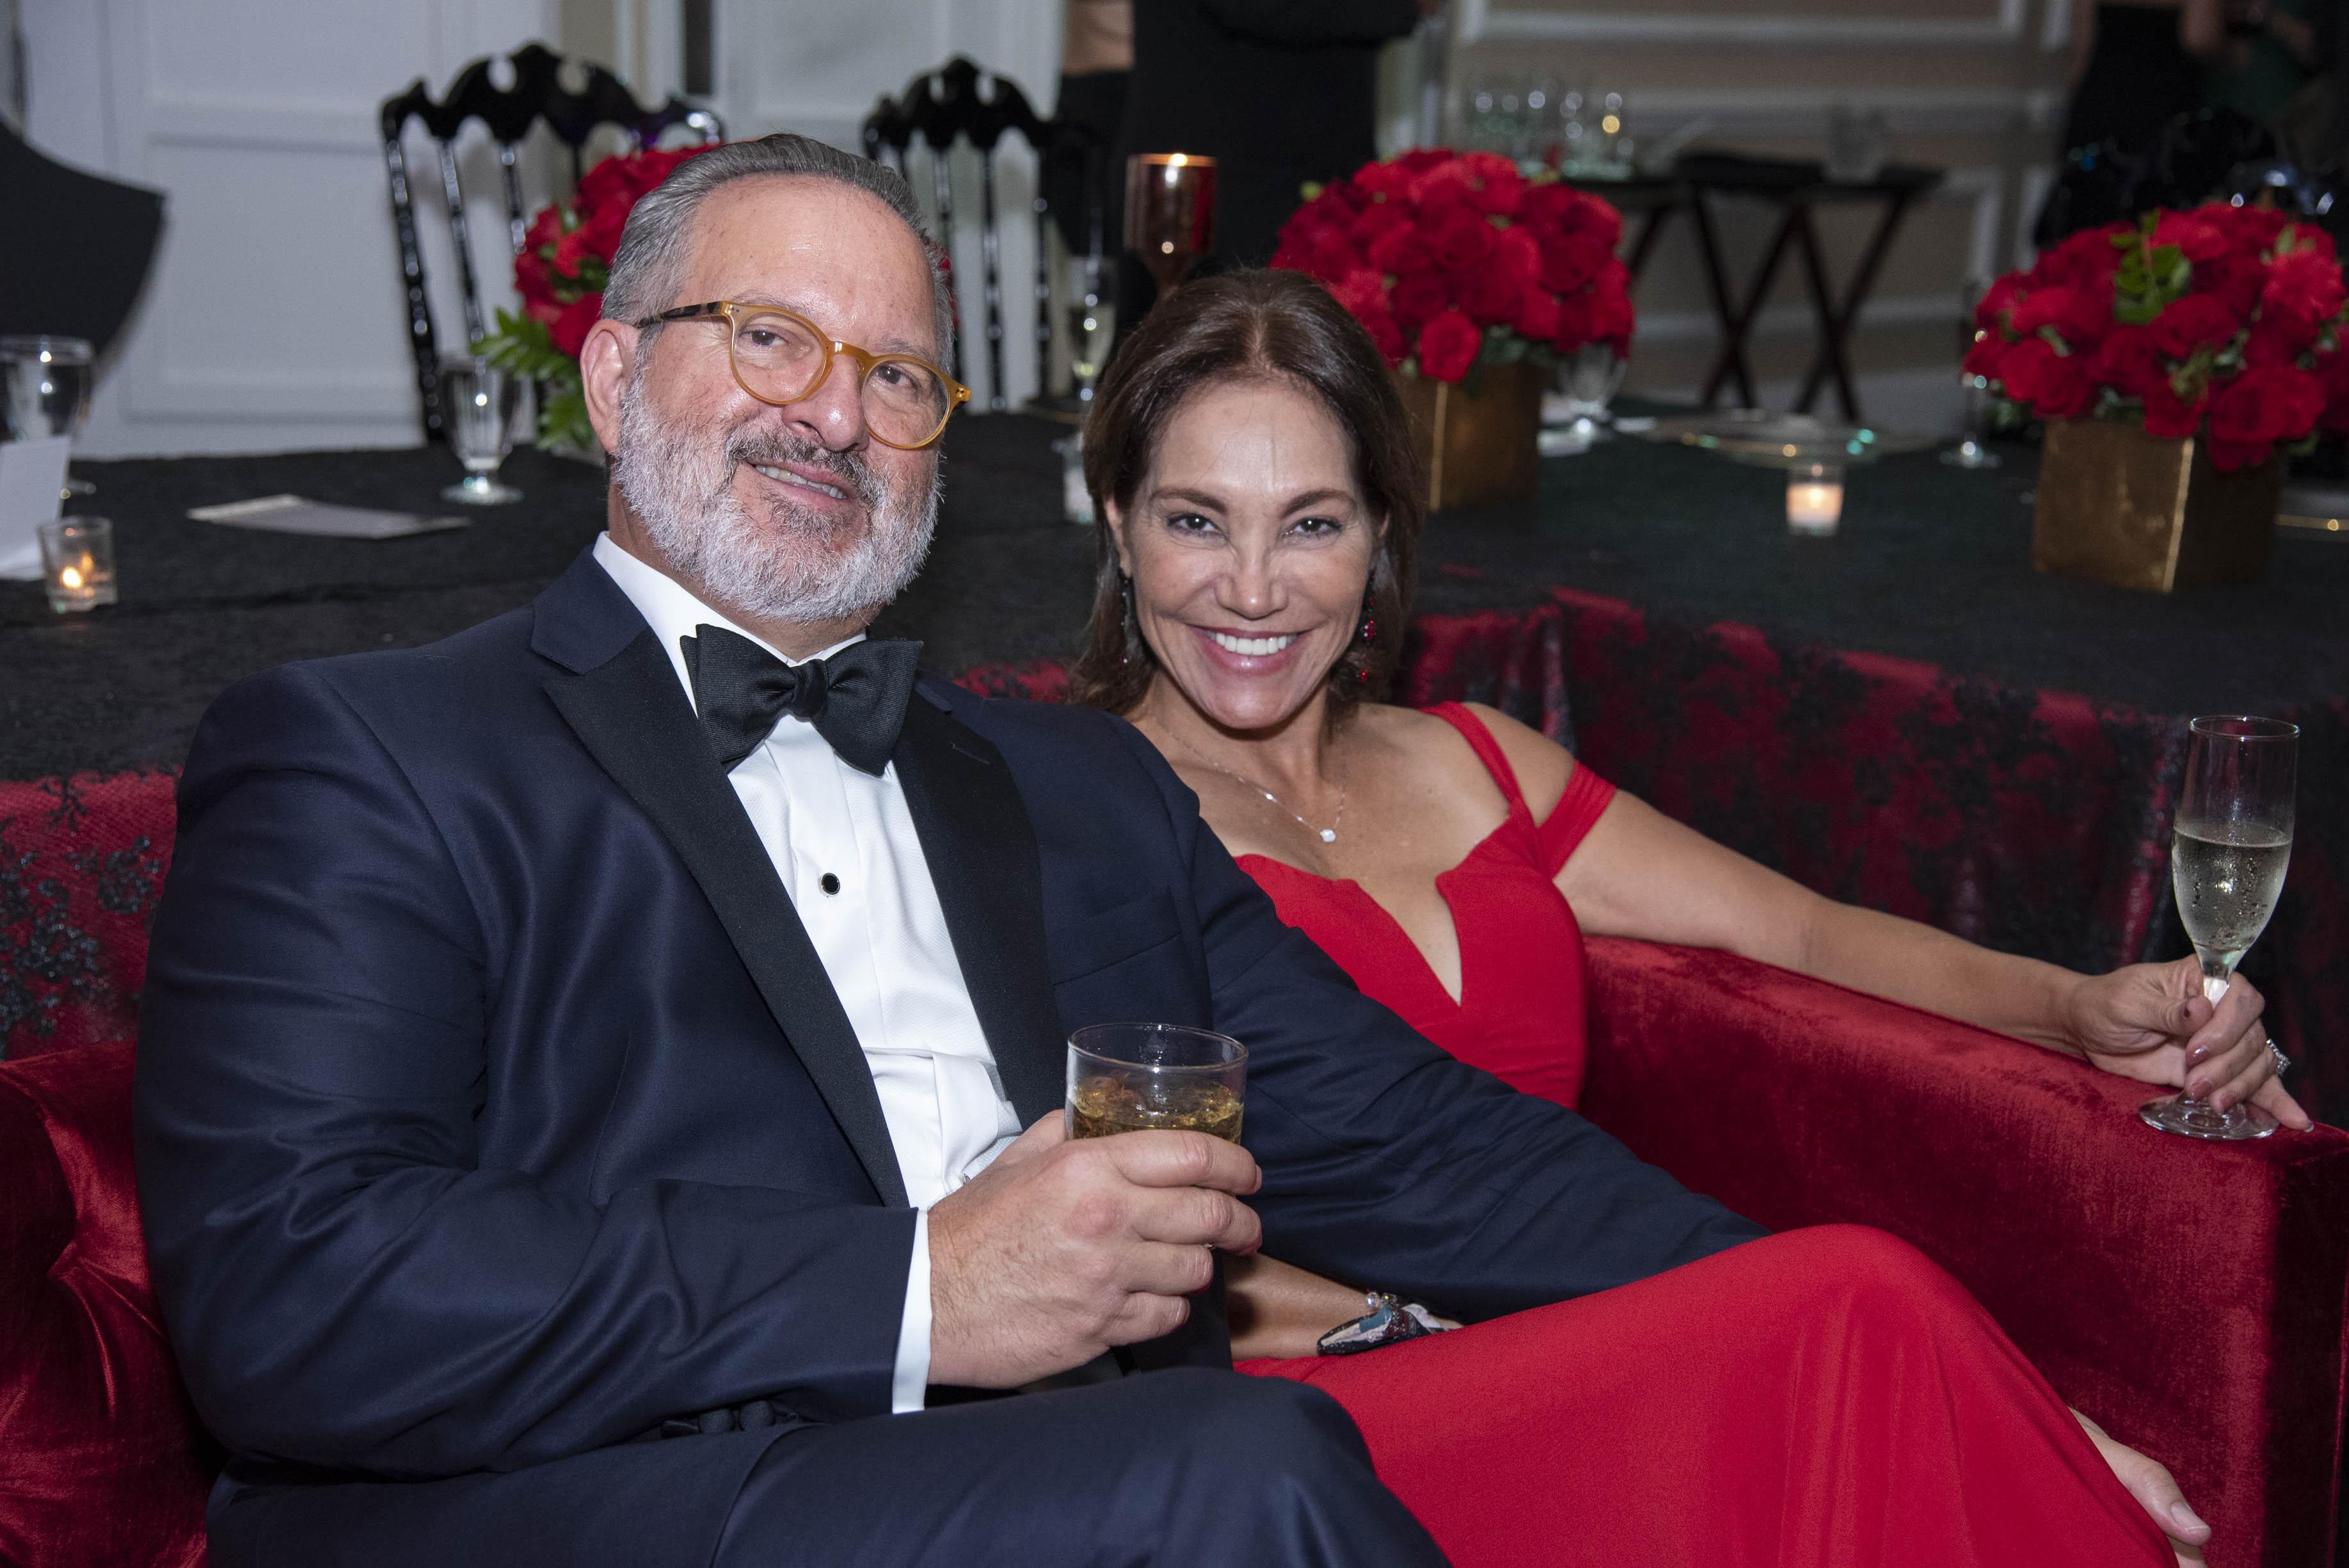 Rodrigo Masses, presidente entrante de la Grand Gala, junto a su esposa Elizabeth Plaza. (Suministrada)